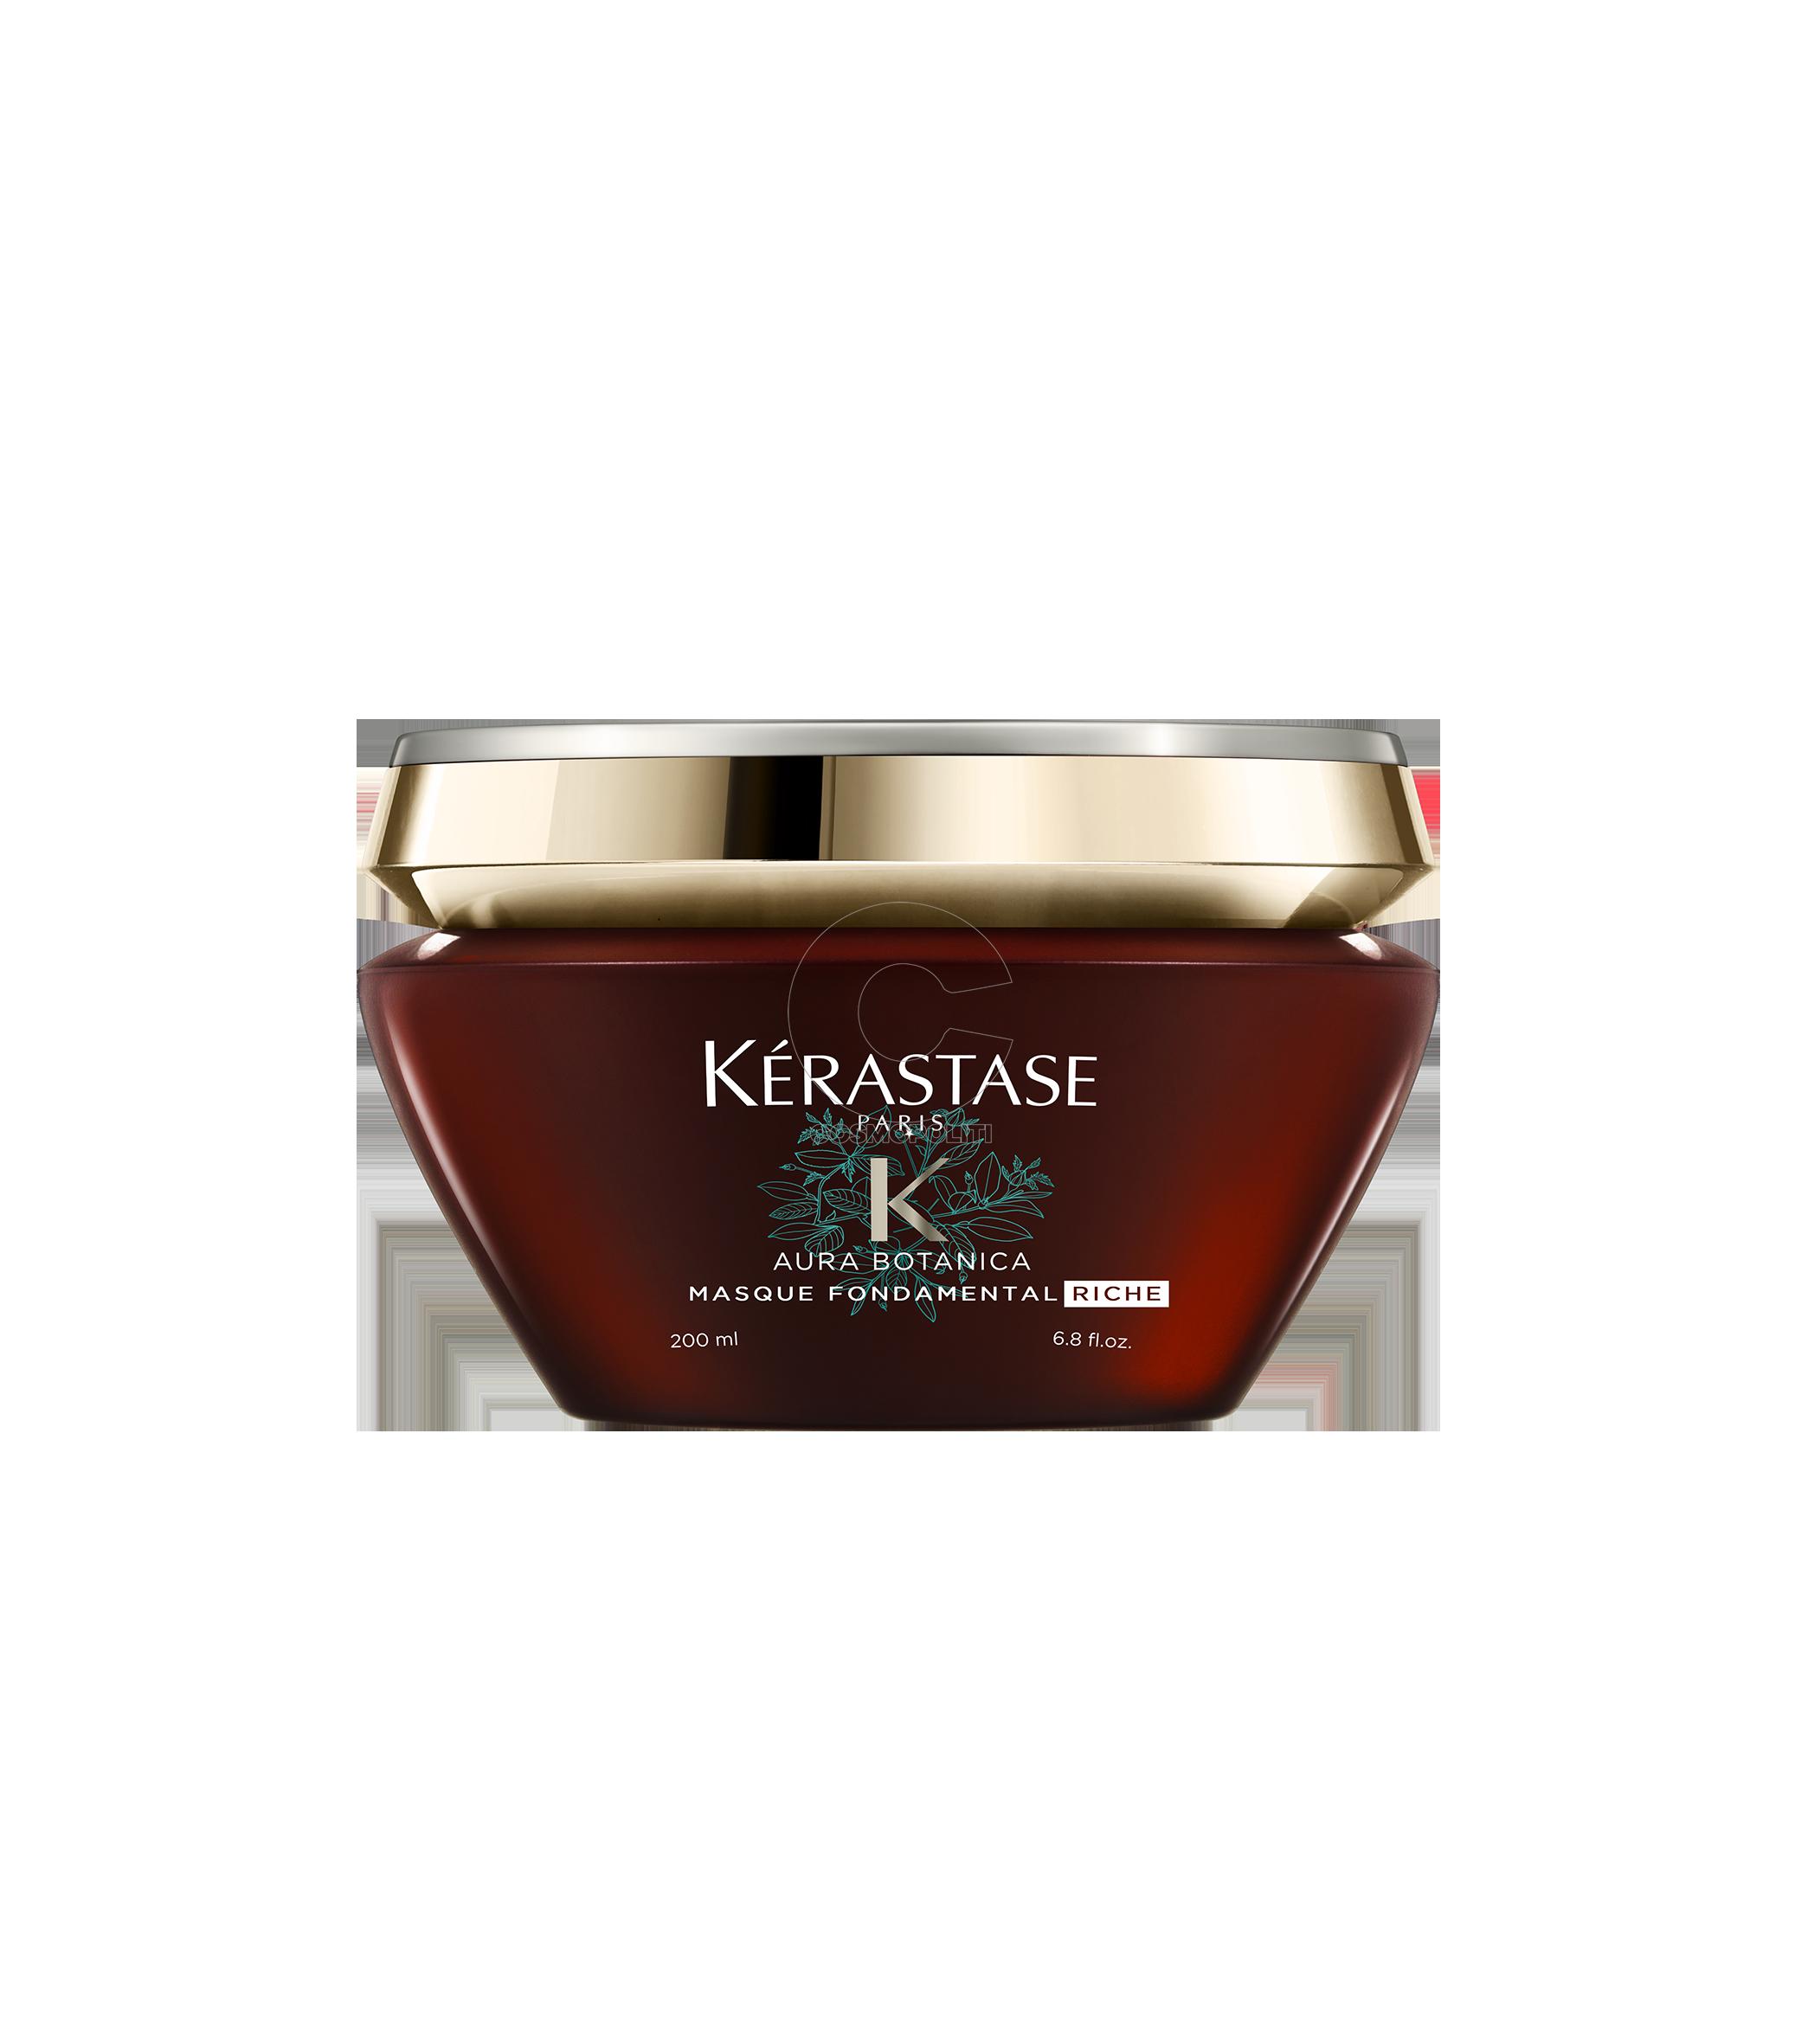 Kerastase - Aura Botanica - Masque (HD) new2